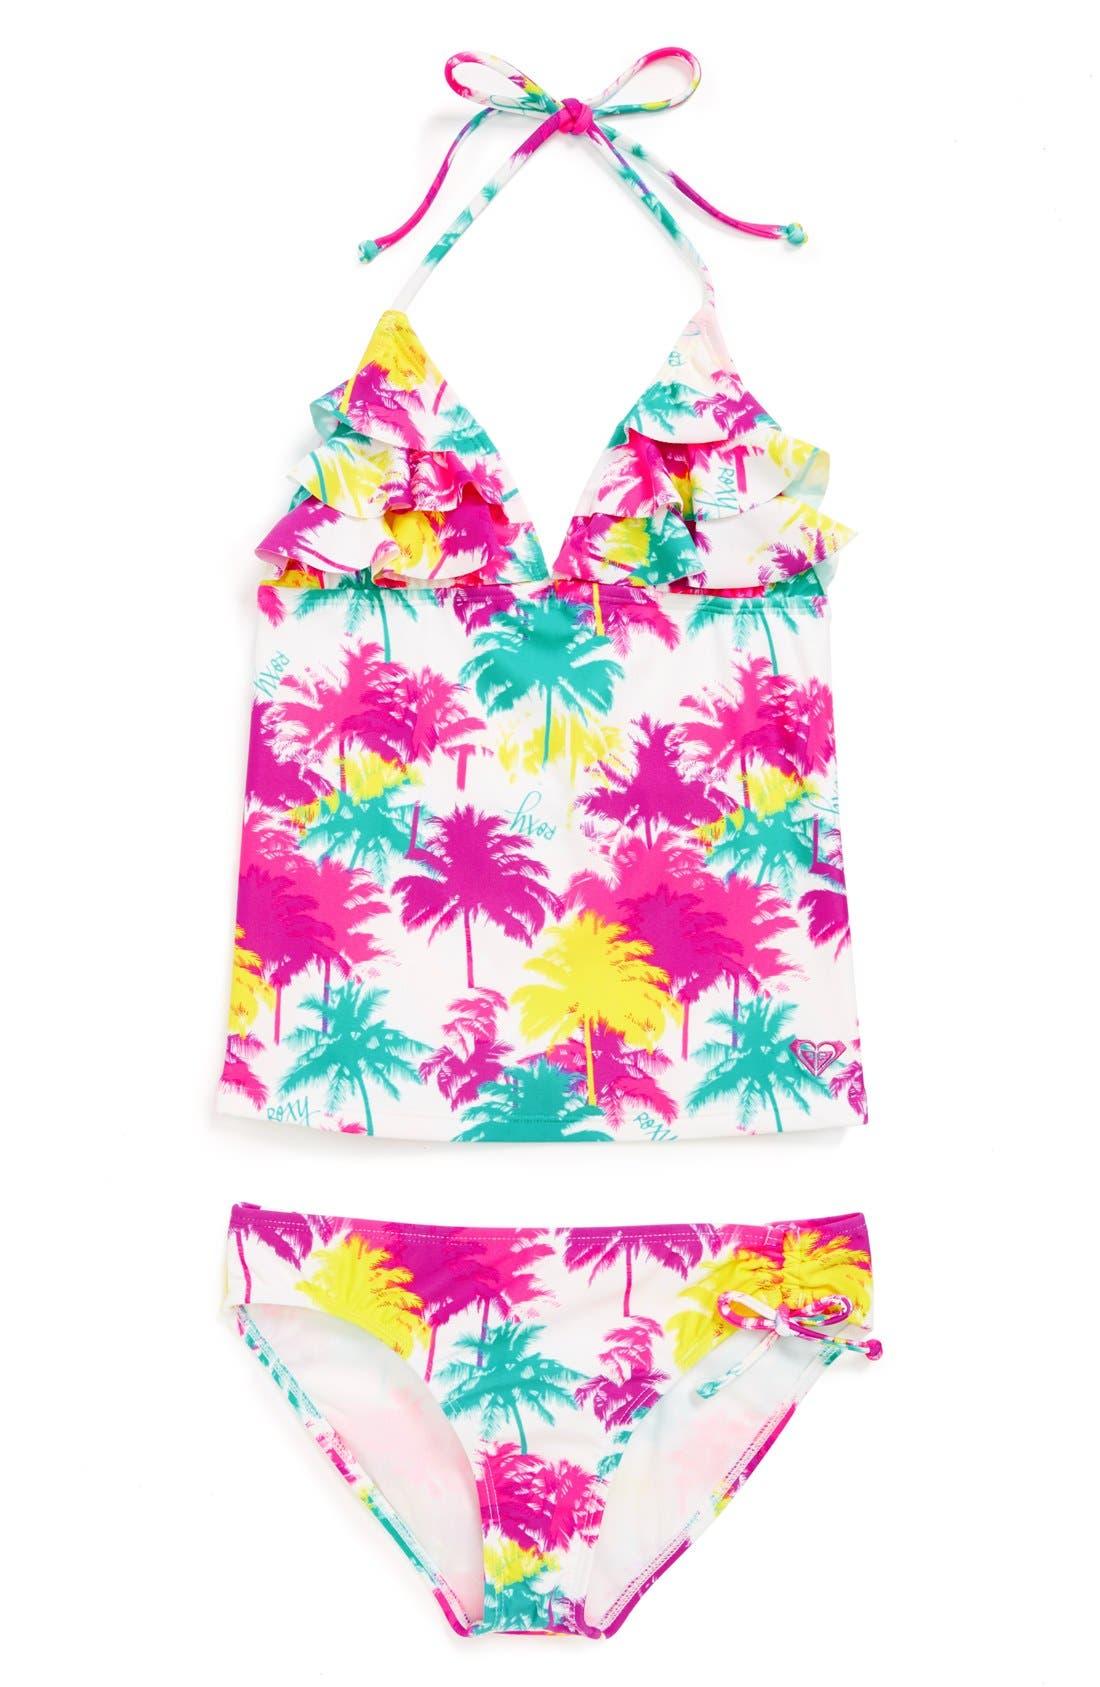 Alternate Image 1 Selected - Roxy Two-Piece Tankini Swimsuit (Big Girls)